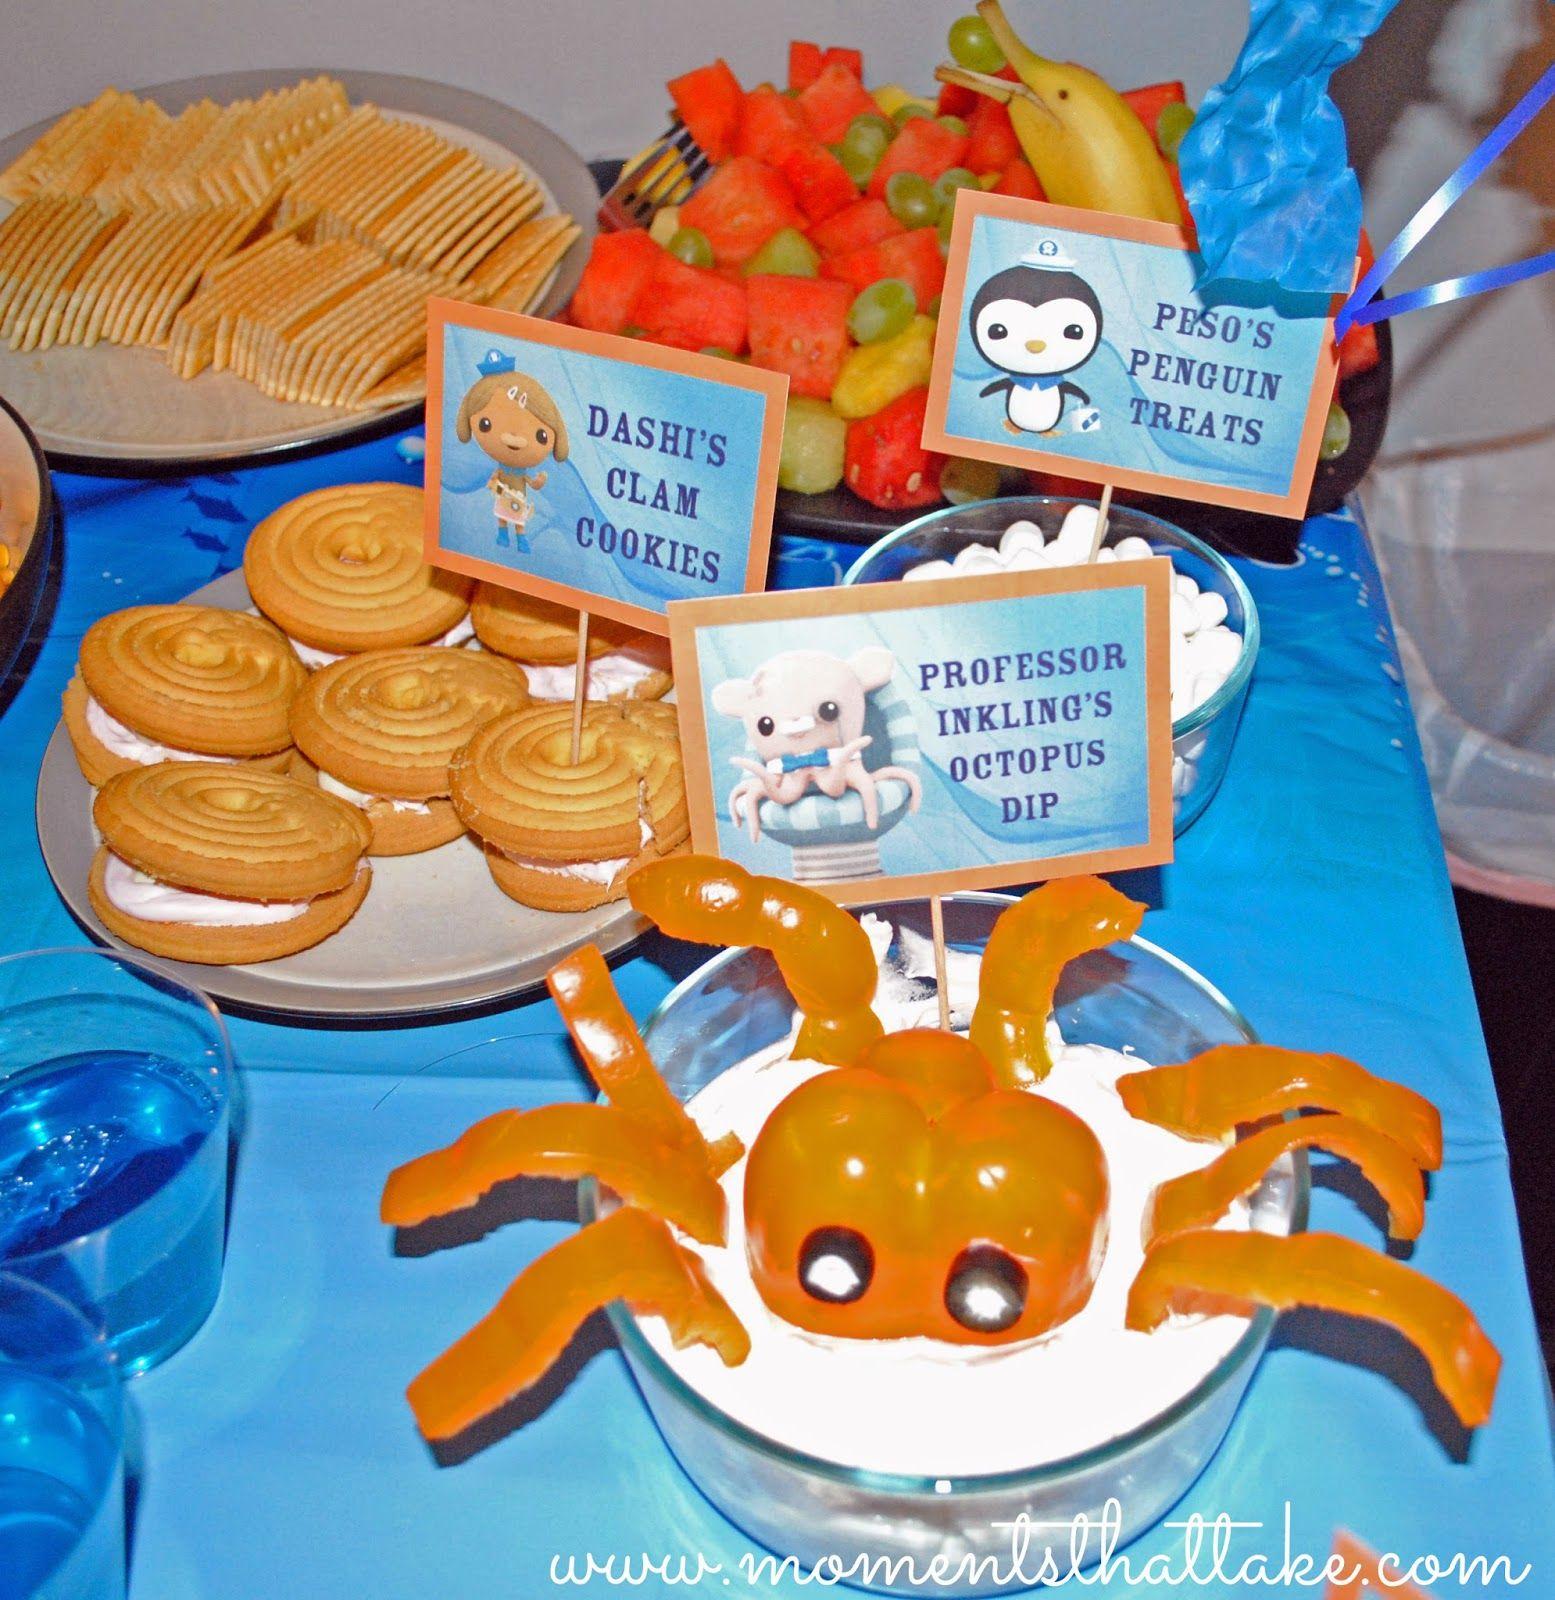 Octonauts Birthday Party Food Ideas Professor Inklings Octopus Dip Bell Pepper